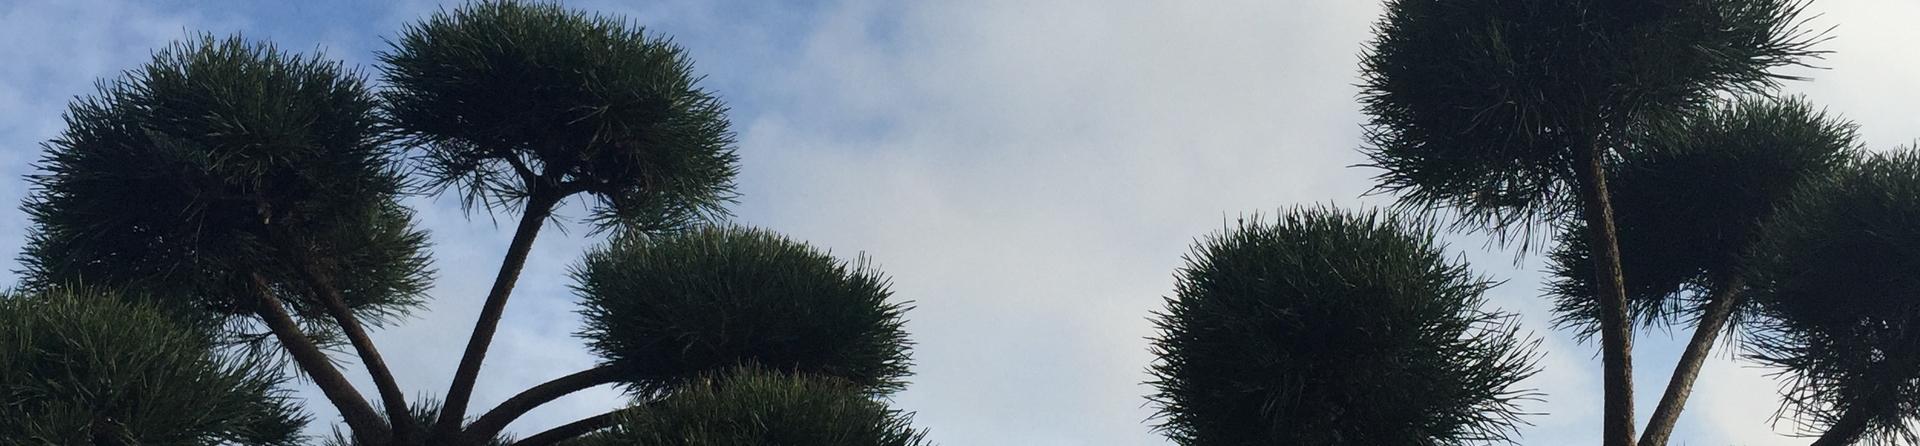 Pinus sylvestris clouds